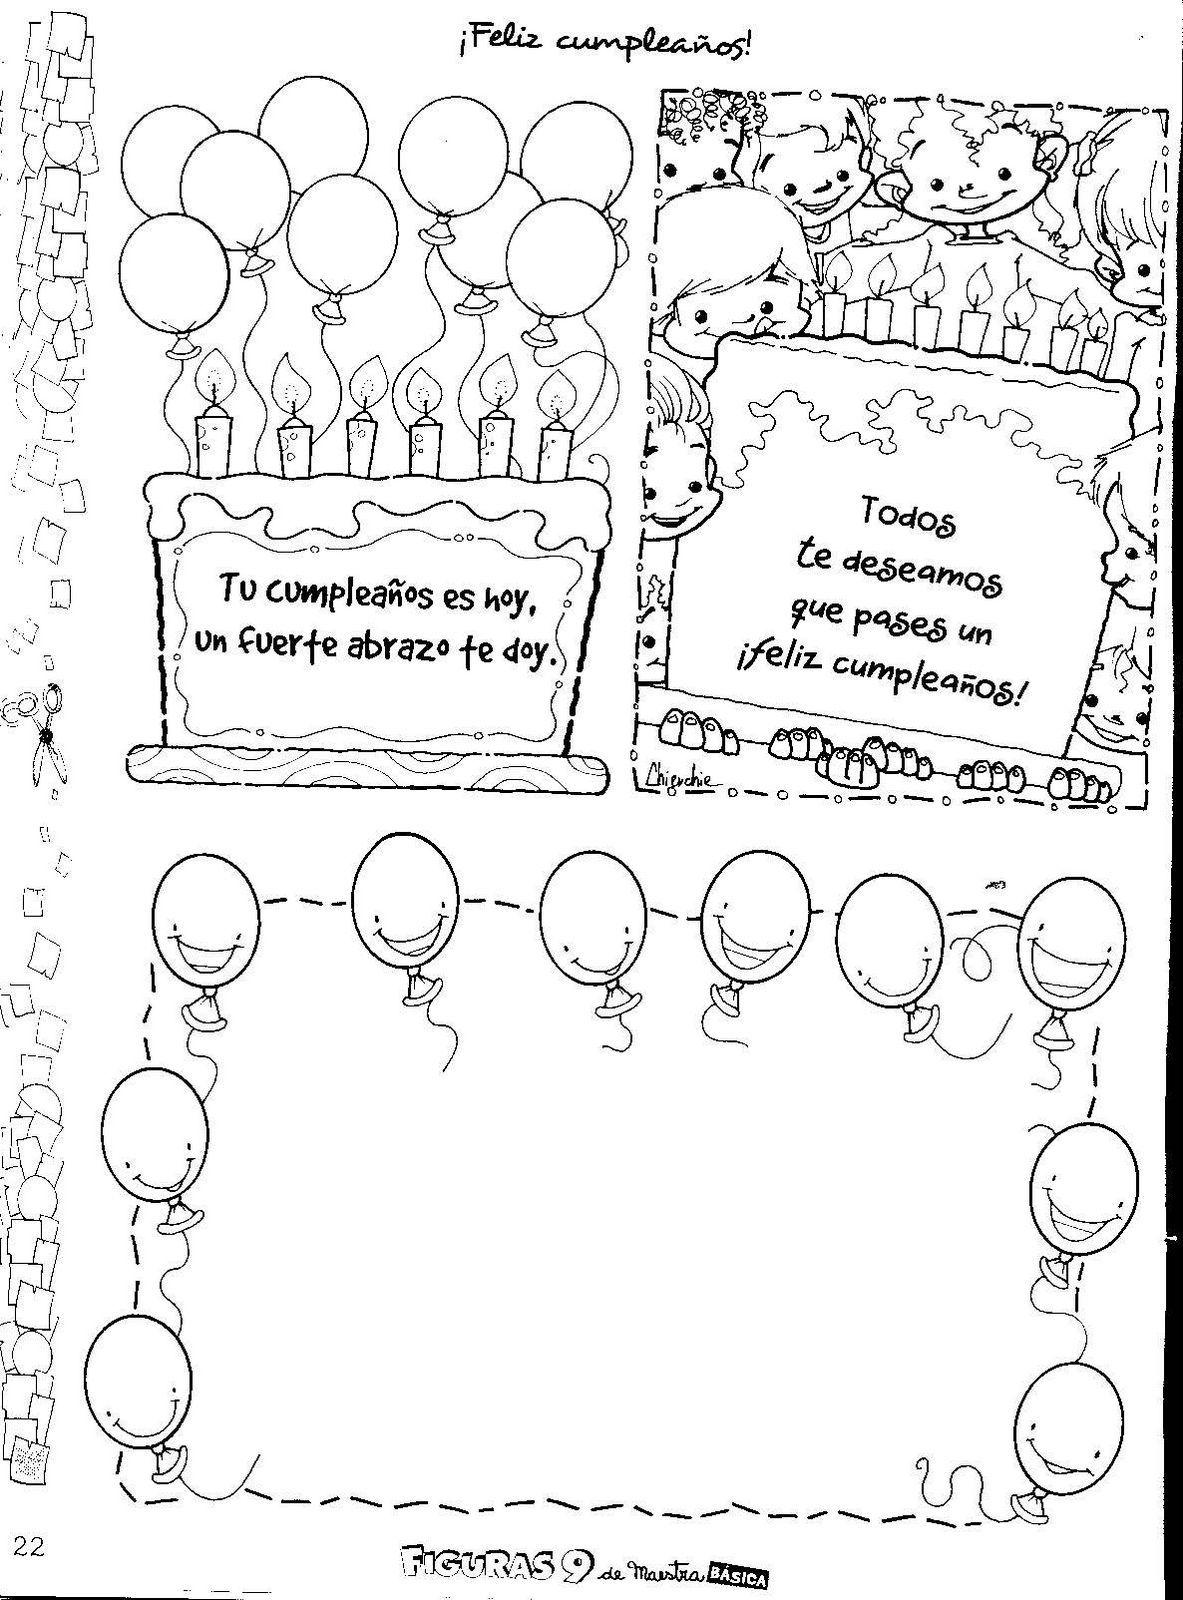 Cumpleaños.. | Birthday at school... | Pinterest | Cumpleaños ...